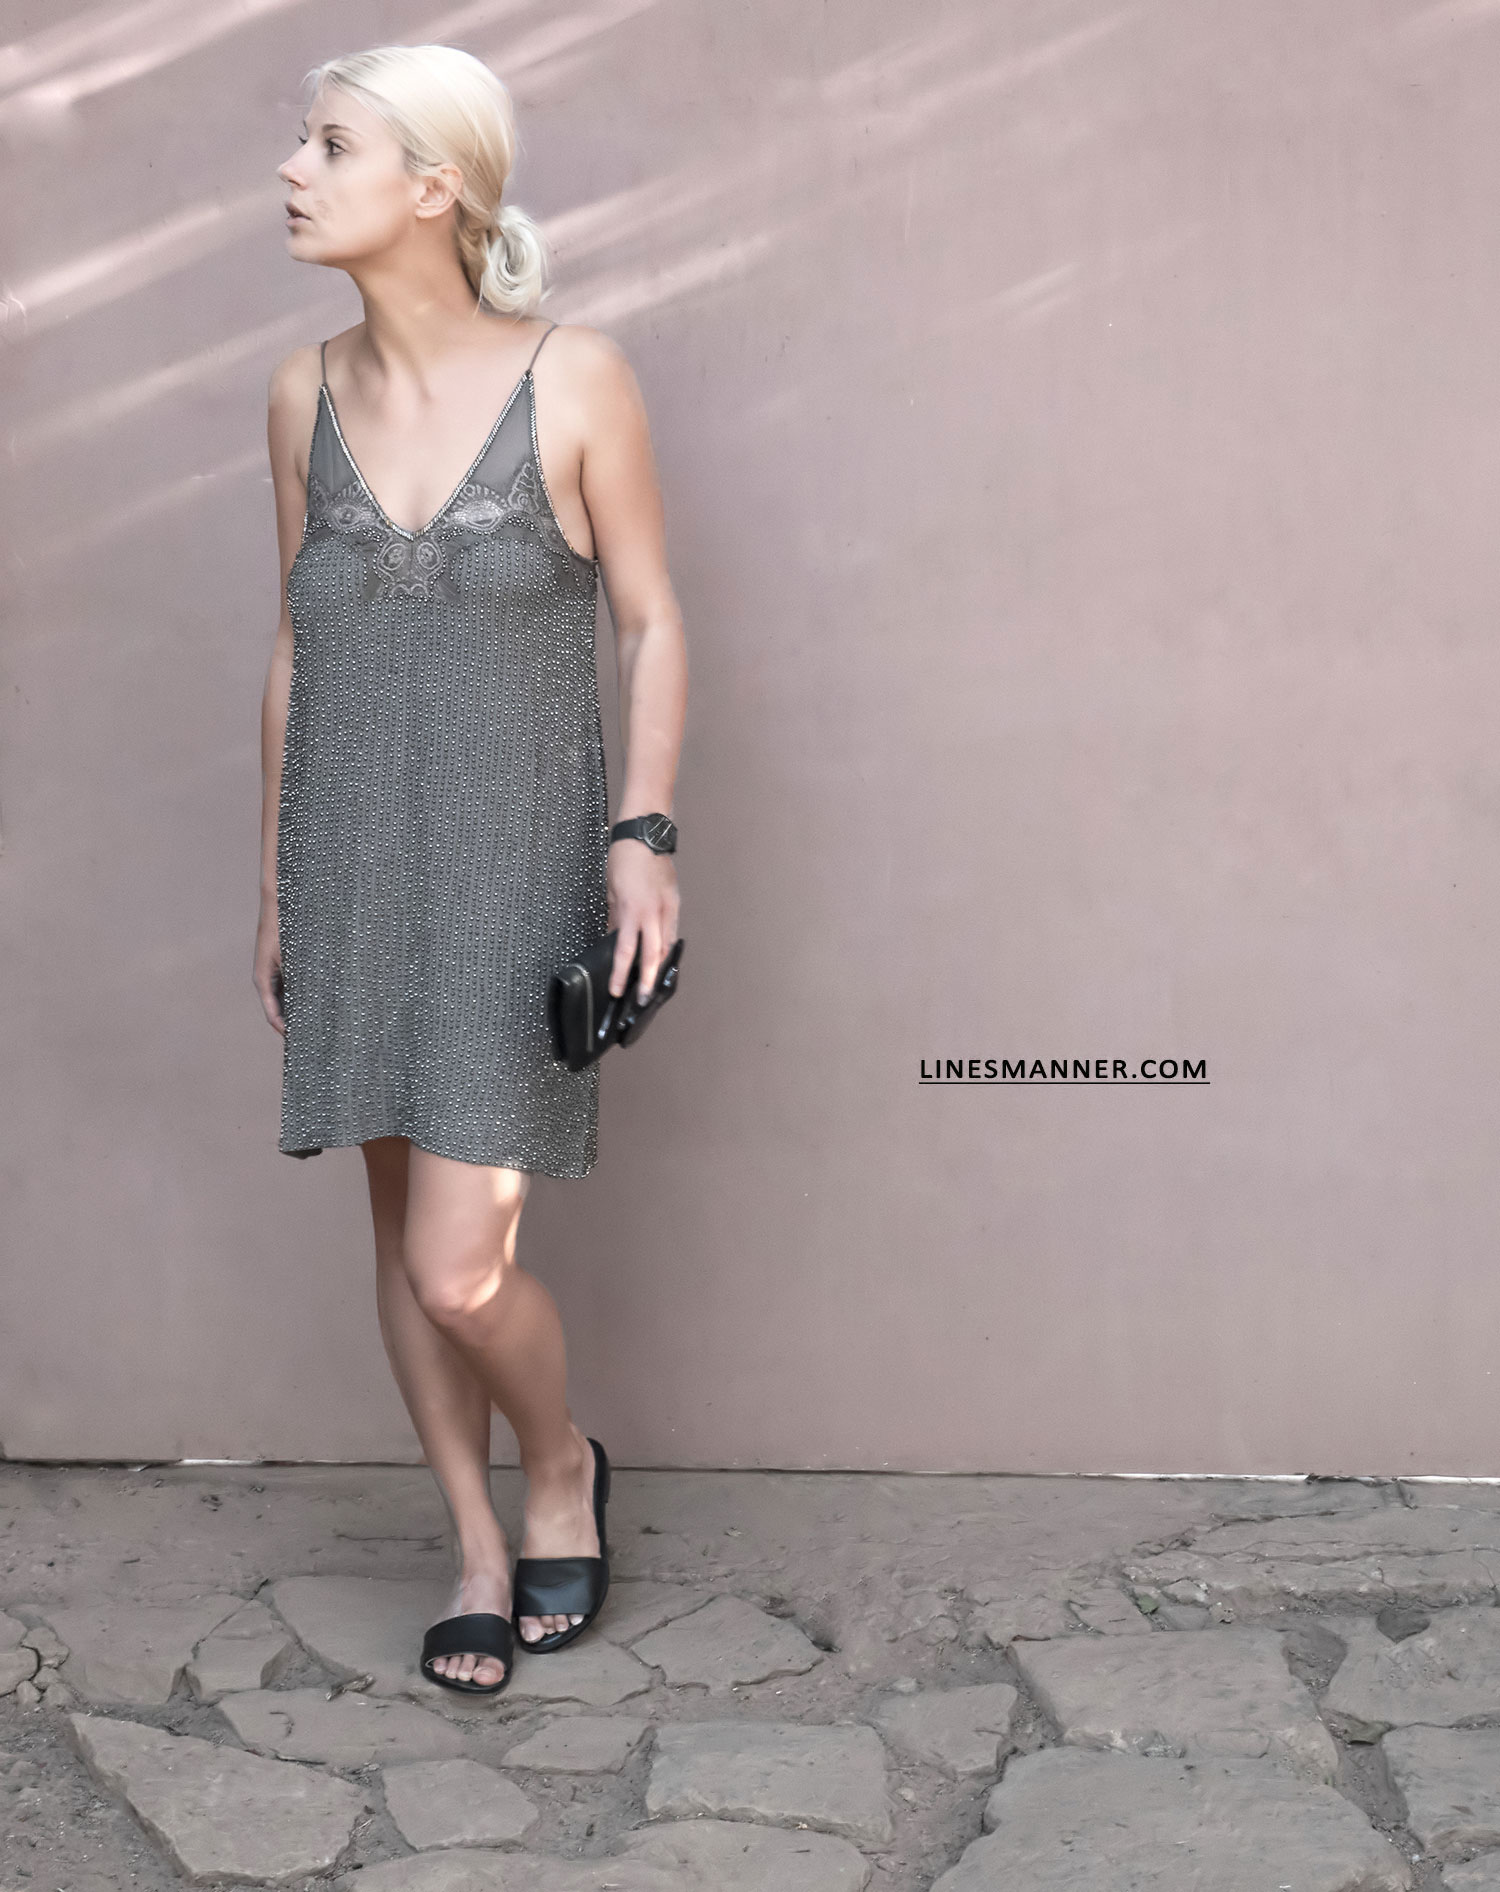 Lines-Manner-Magali_Pascal-Boheme-Chic-Minimalist-Bare_Minimal-Essential-Effortless-Details-Organic-Luxurious-Silk-Dress-Lace-9